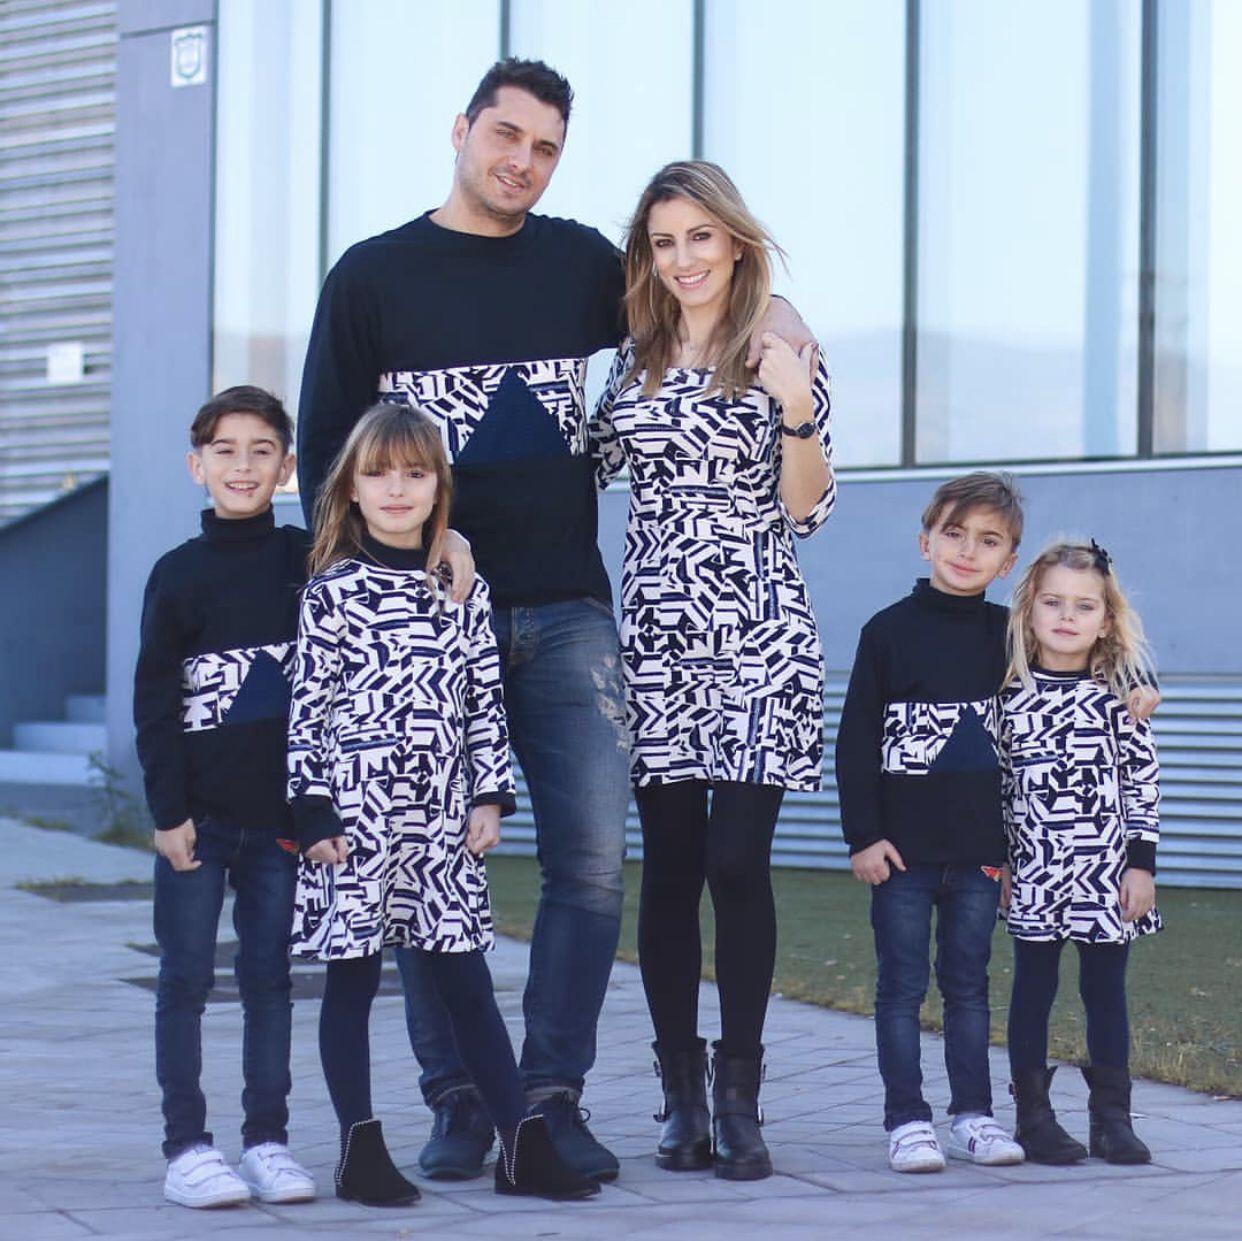 1e604afc9 ... #moda #fashion familia fashion vestir igual, Crazy diseños para toda la  familia moderna #outfits #madreehija #padre #madre #vestidos madre e hijo  niño